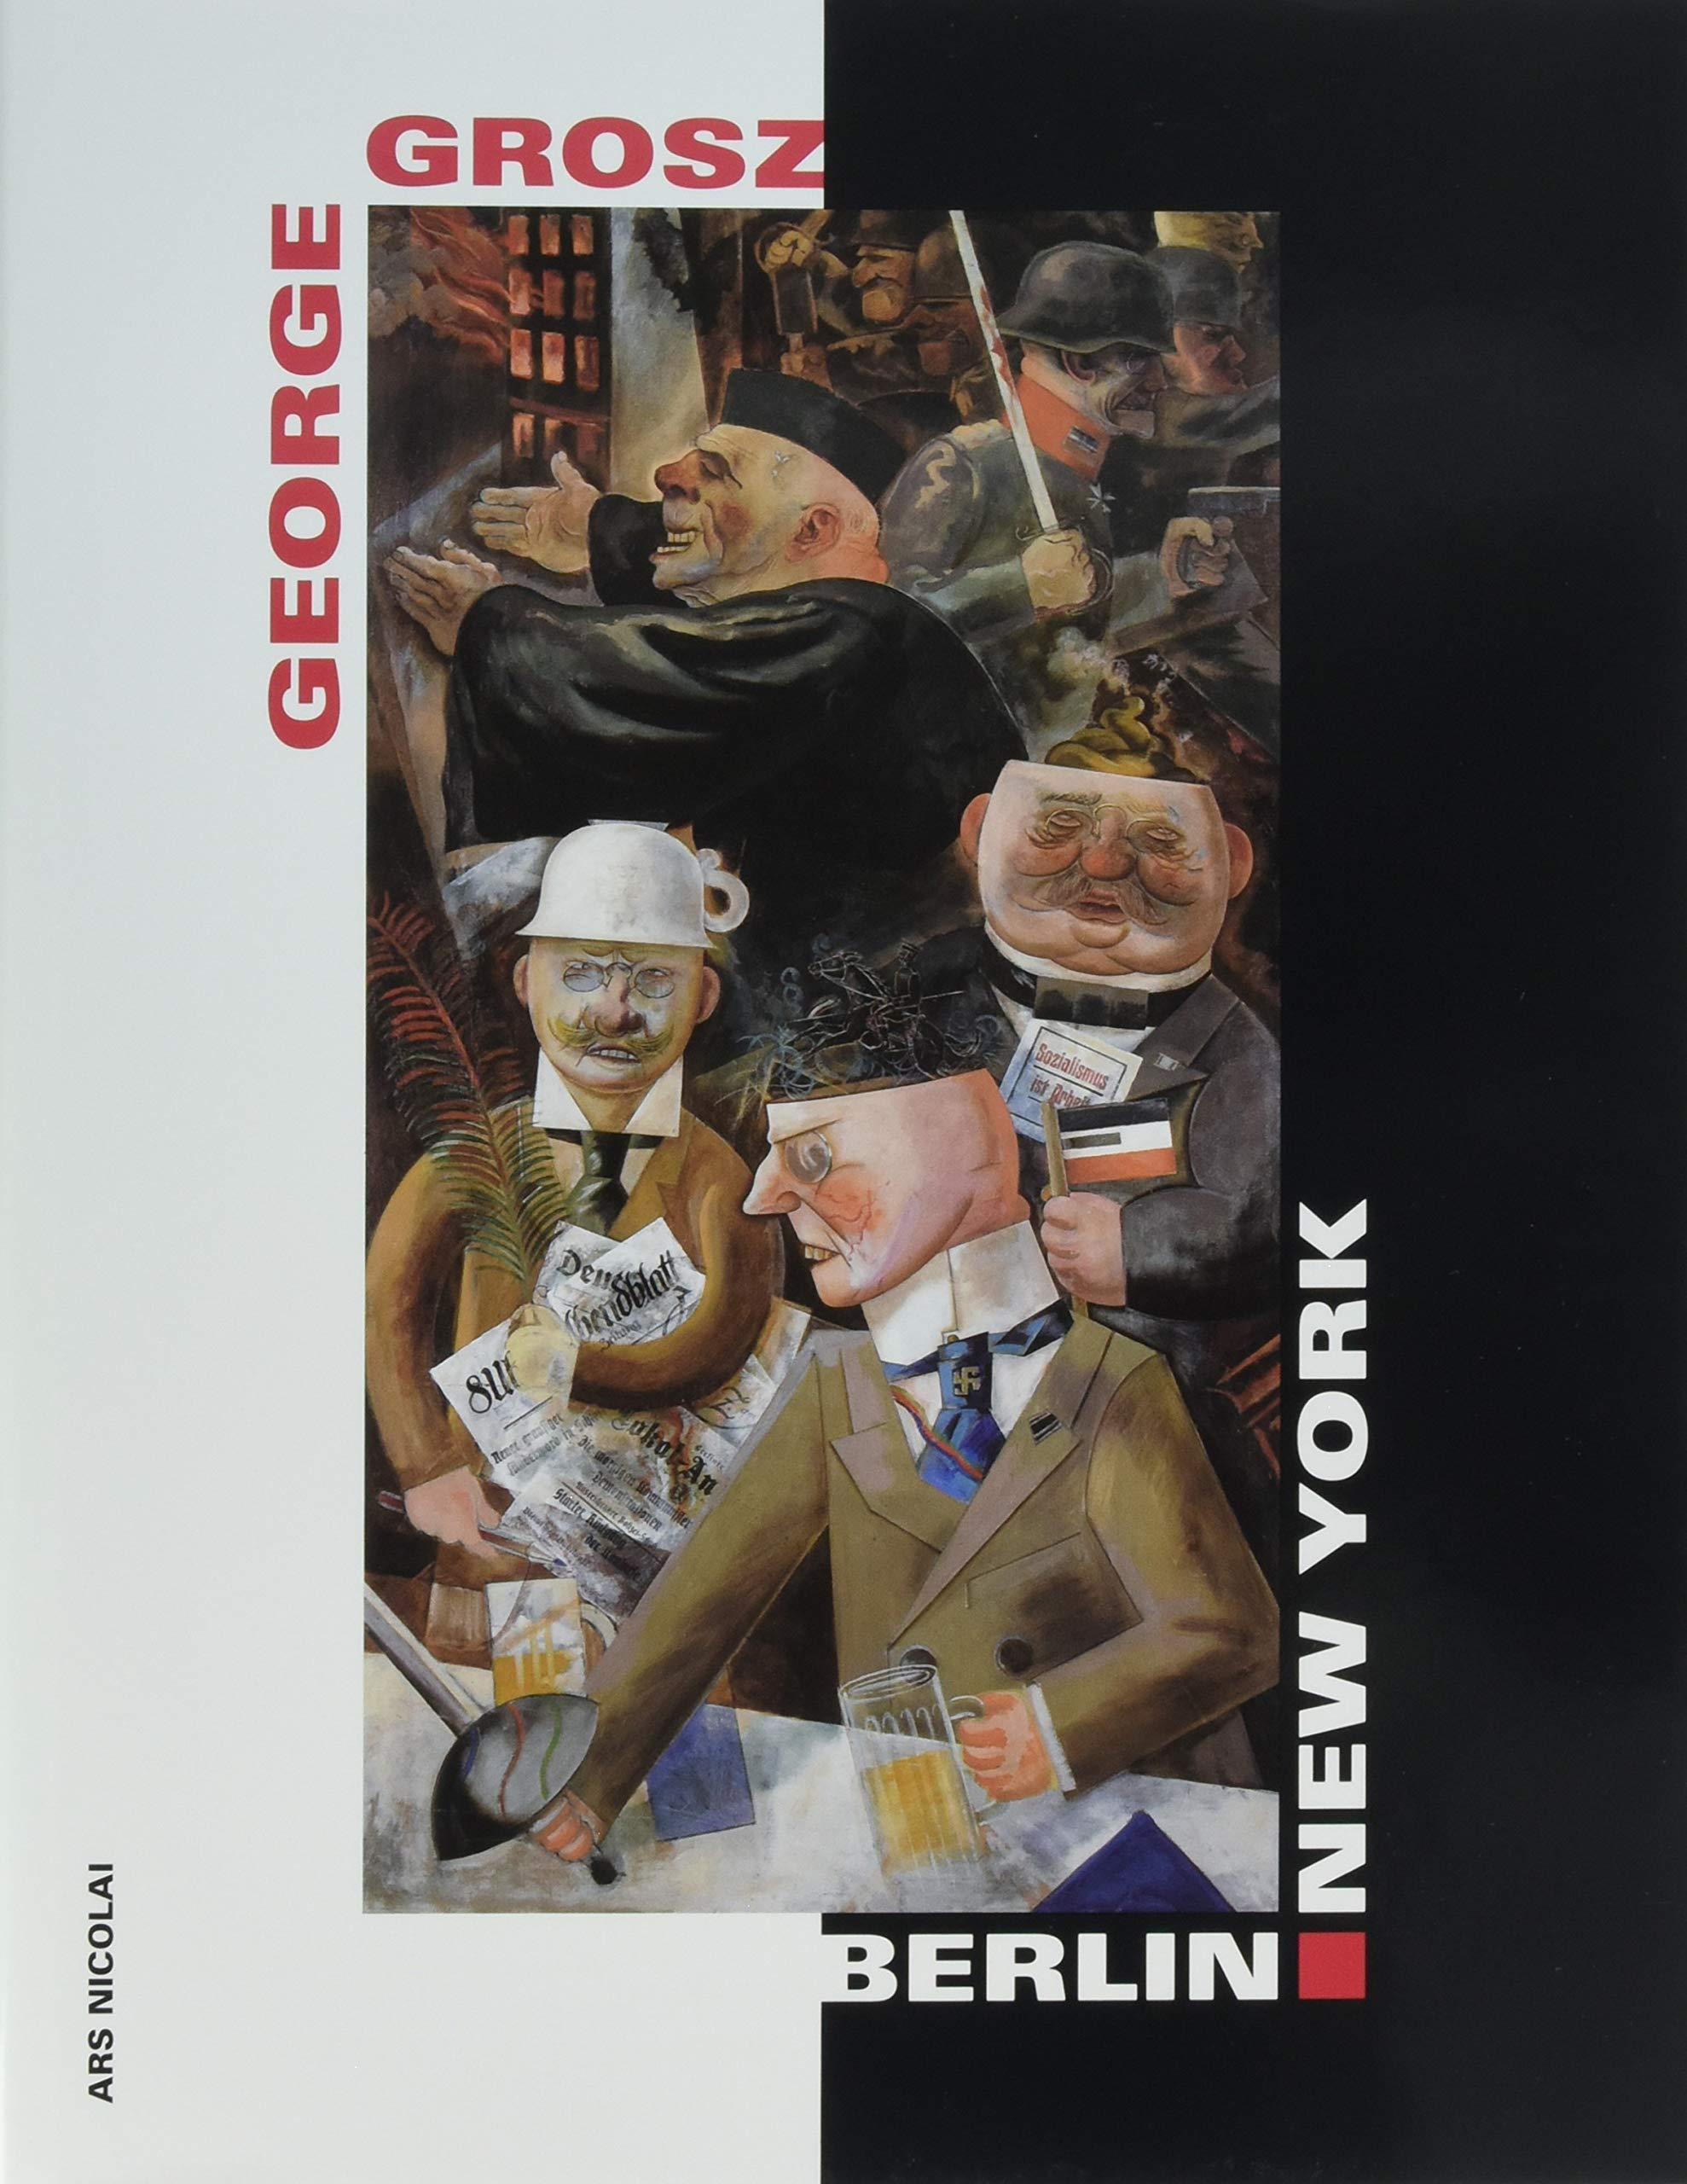 George Grosz Berlin New York Amazon De Neue Nationalgalerie Fremdsprachige Bucher